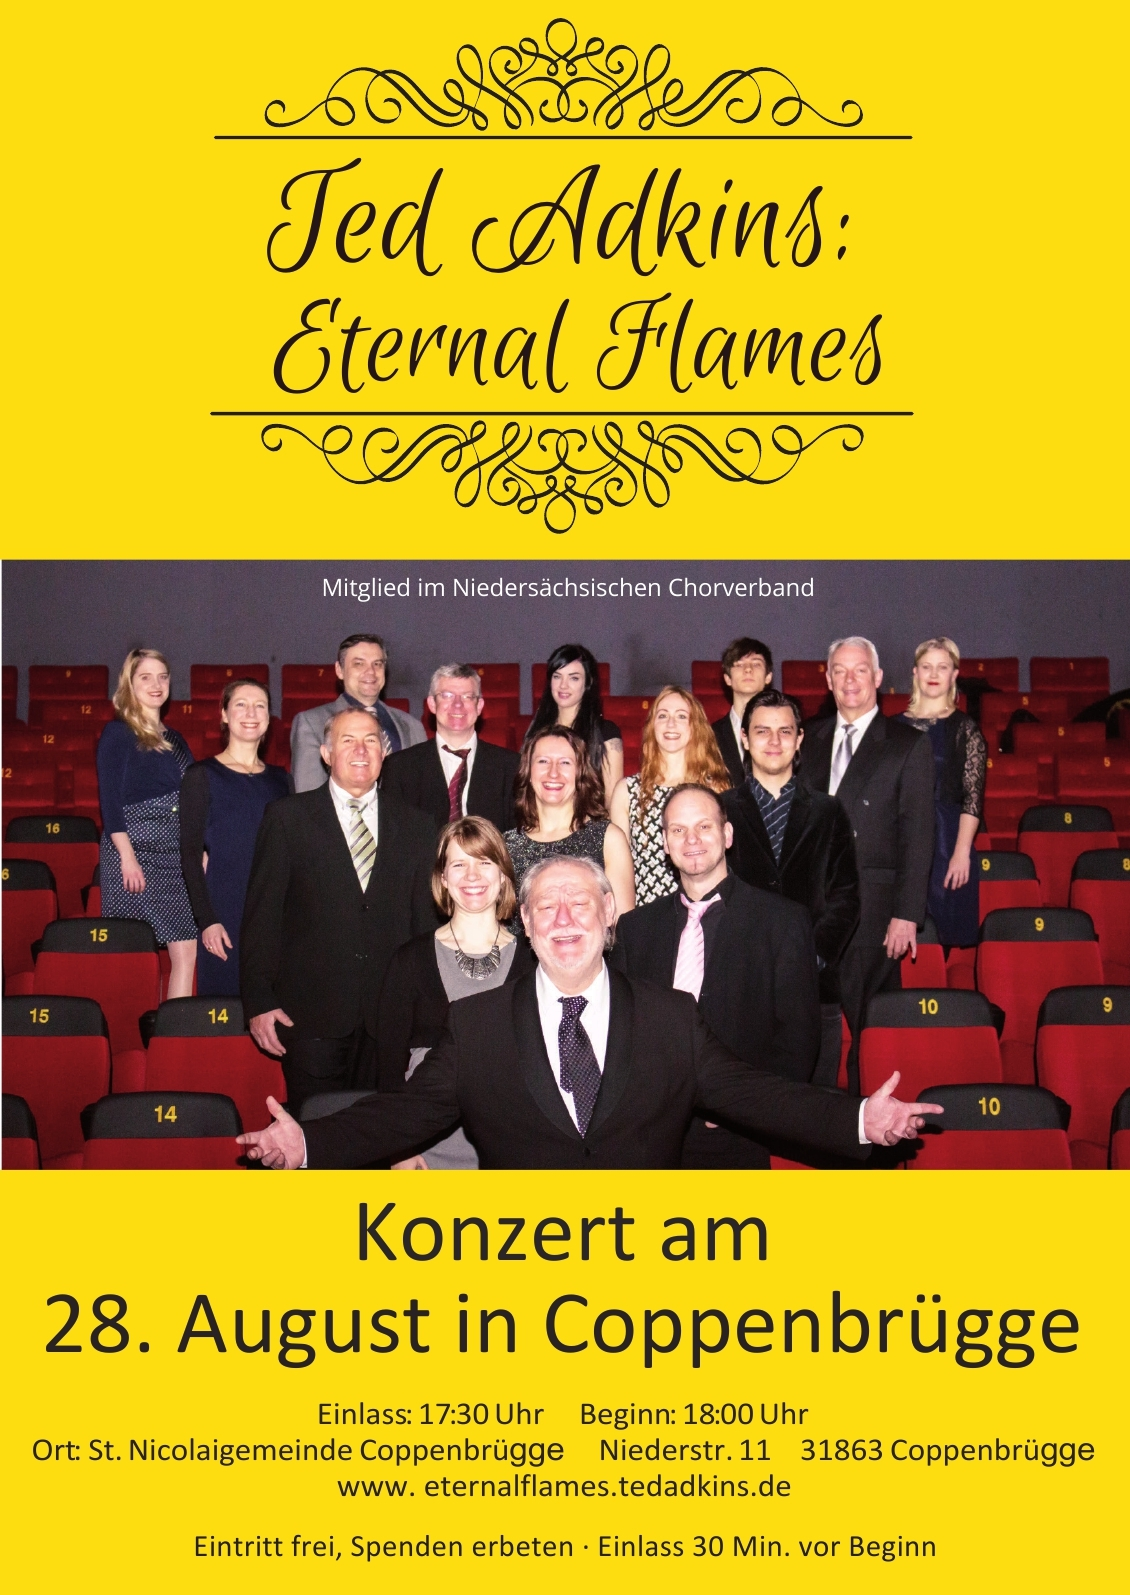 Konzert am 28. August in Coppenbrügge